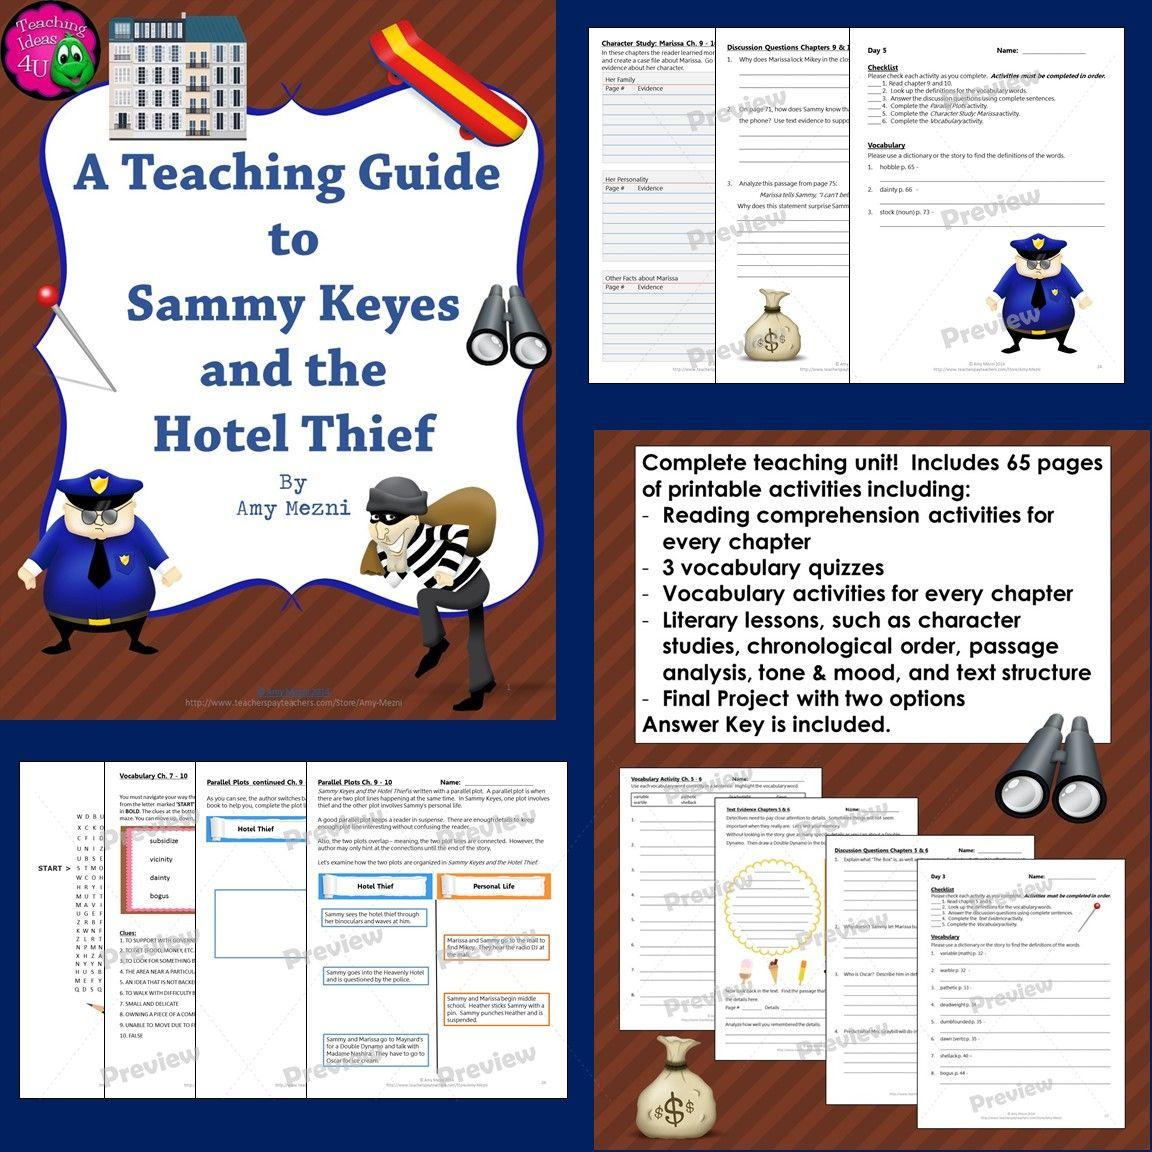 Mentoring Teachers Resources - 401808